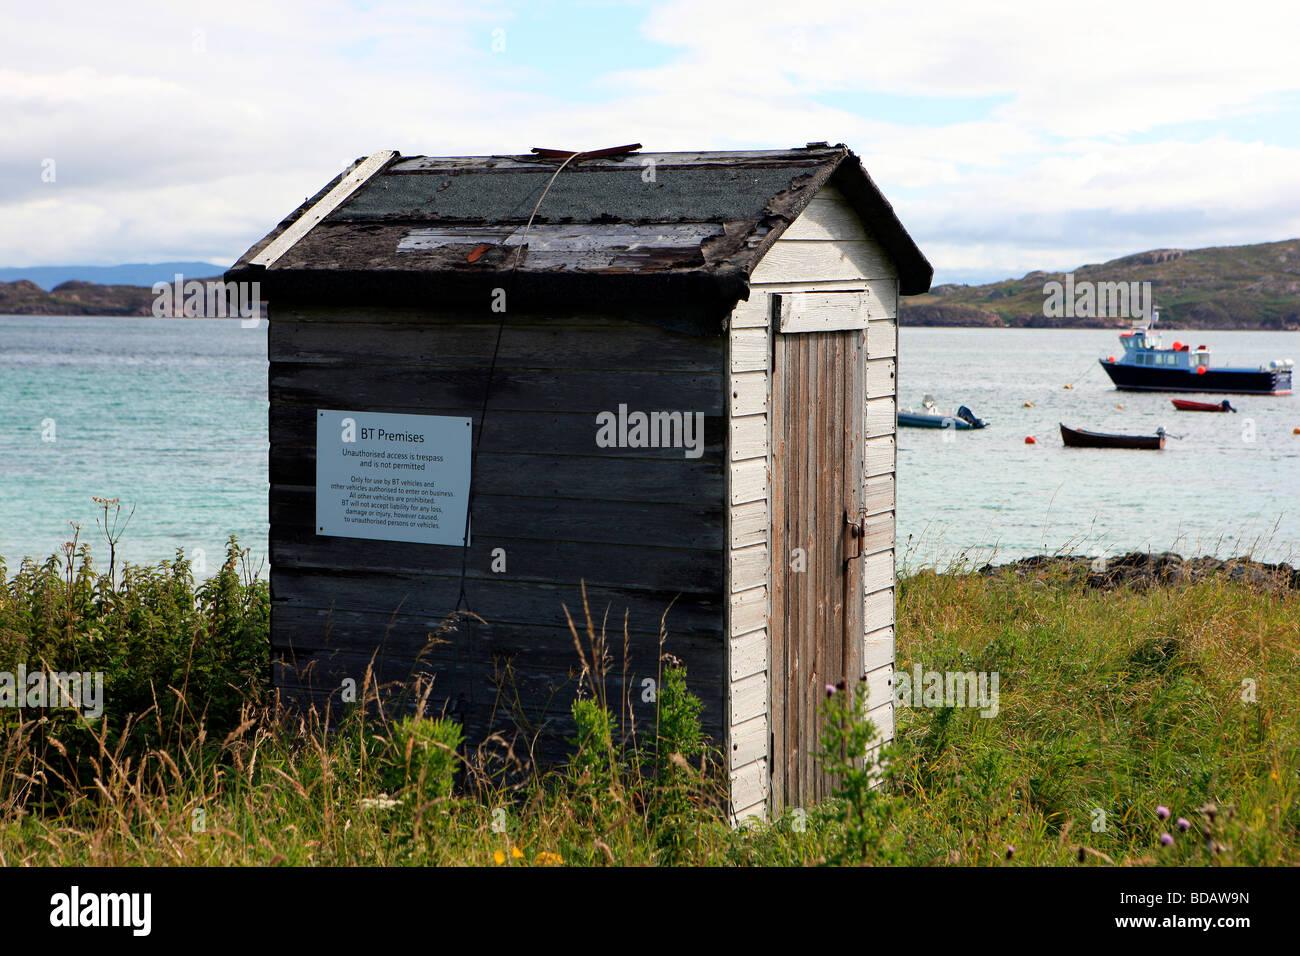 BT premises on the Isle of Iona Stock Photo